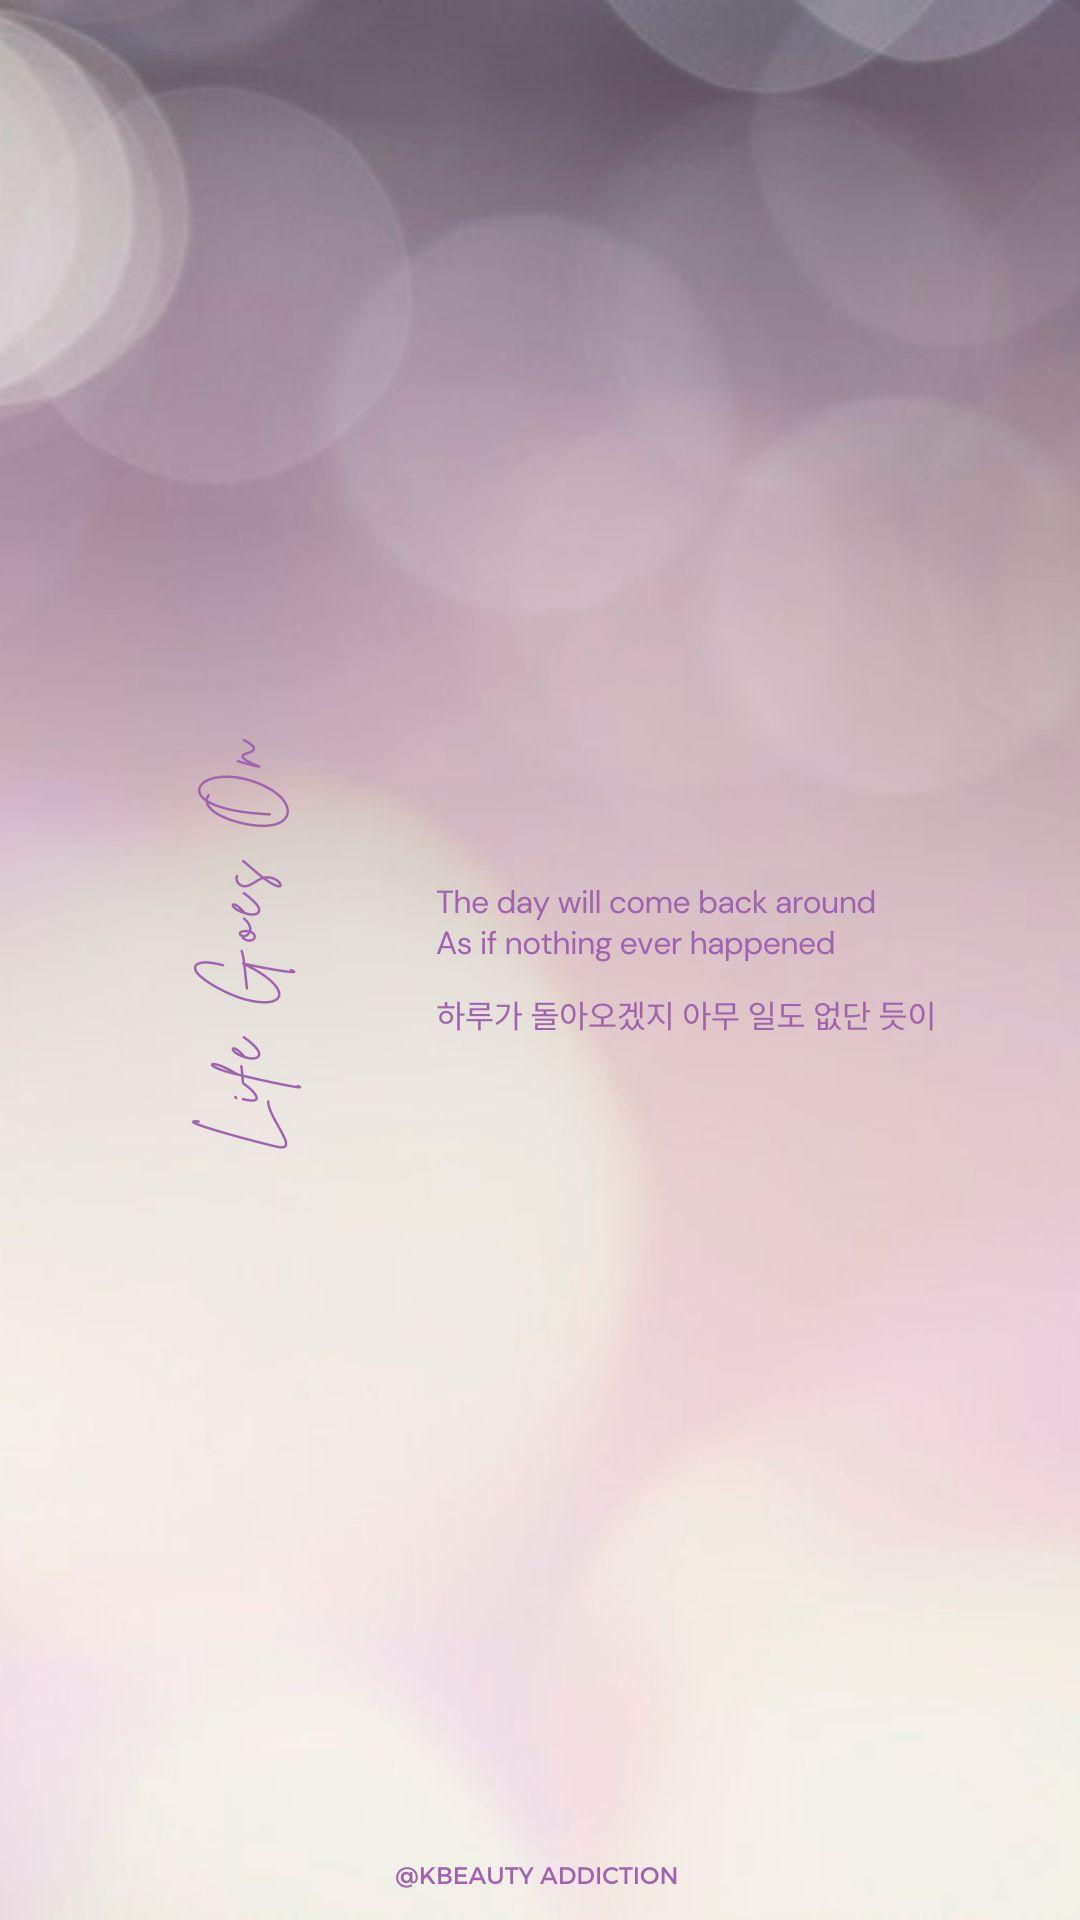 50+ BTS Lyrics Wallpaper for Your iPhone | Kbeauty Addiction